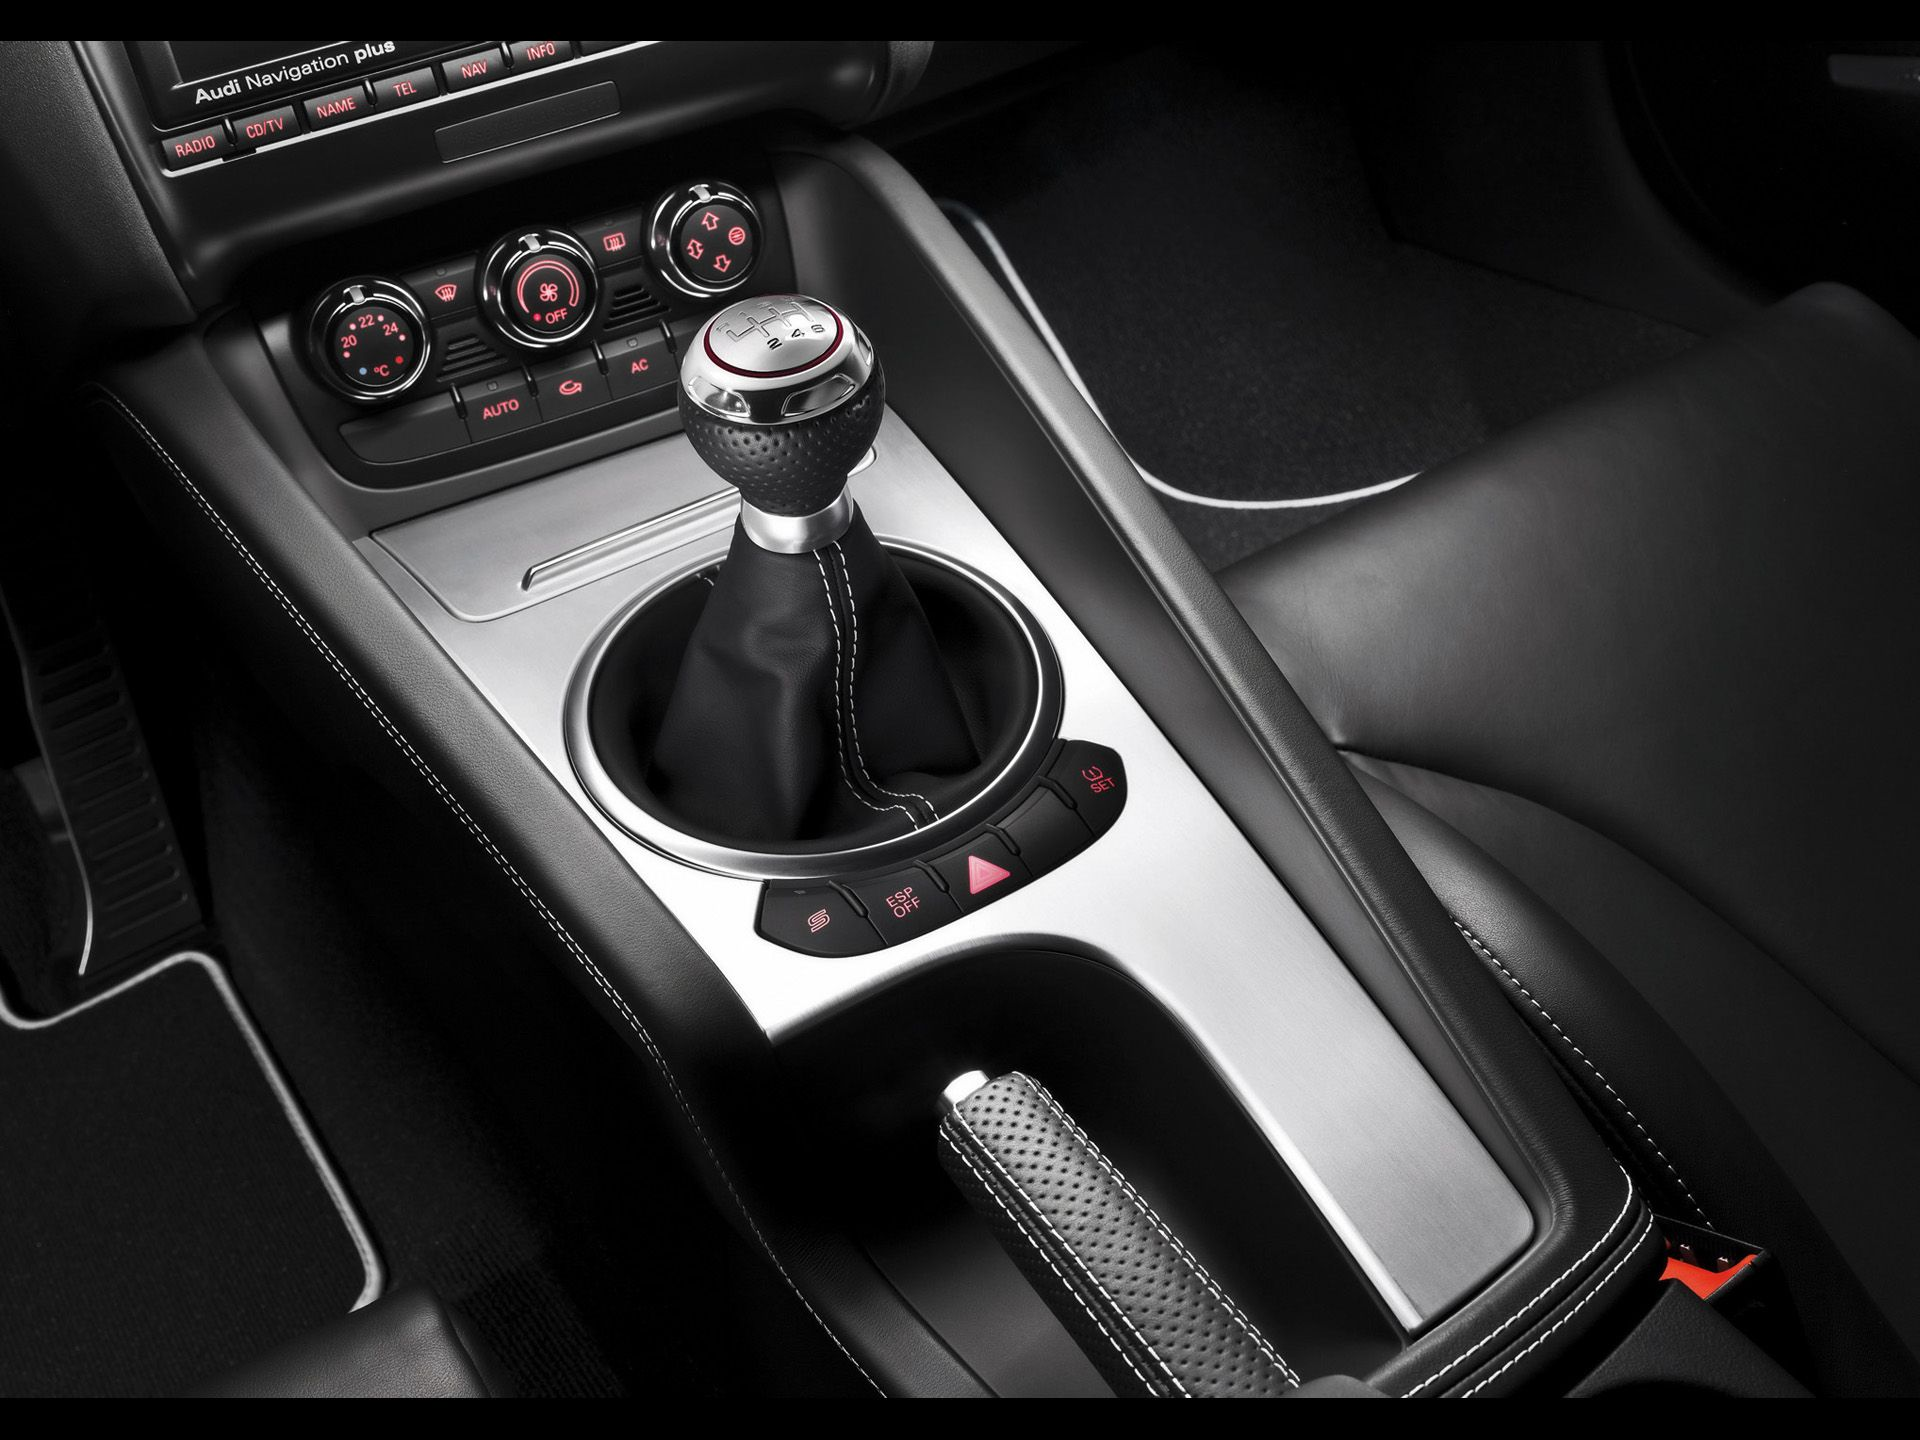 2009 Audi Tt Rs Coupe Console 1920x1440 Wallpaper